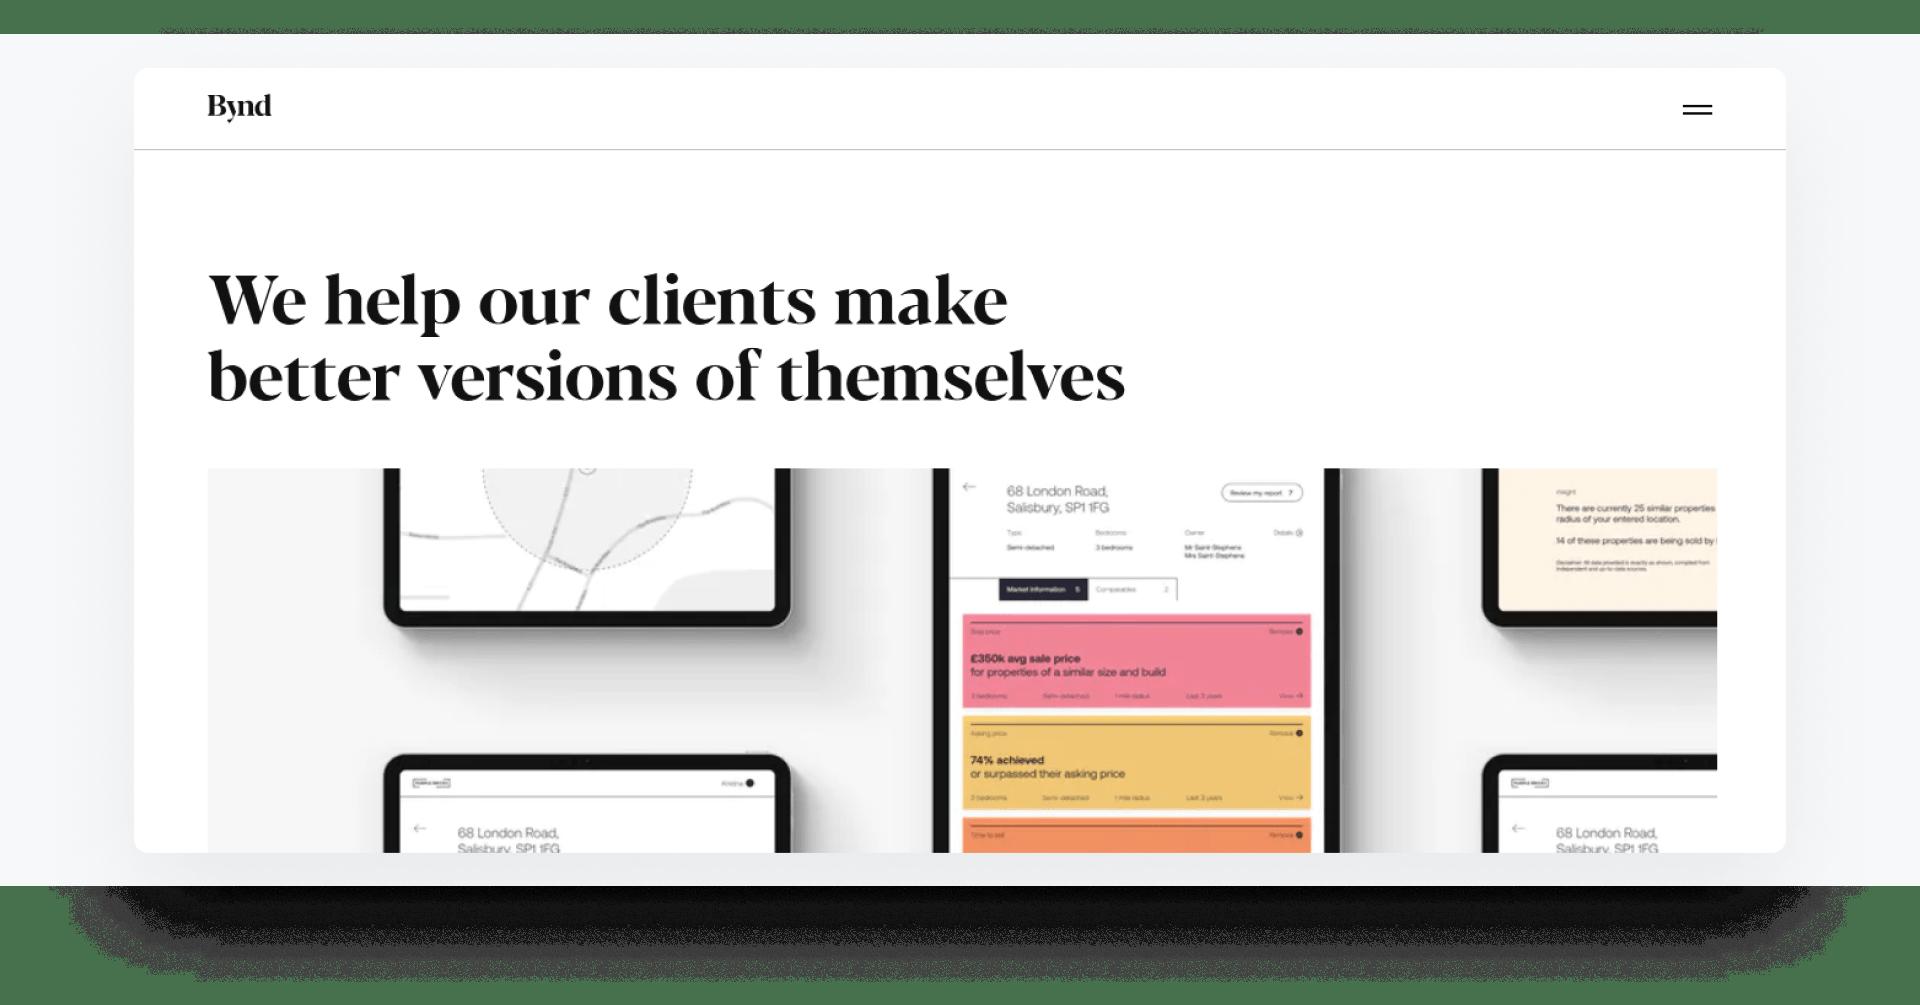 Beyond - development company home page